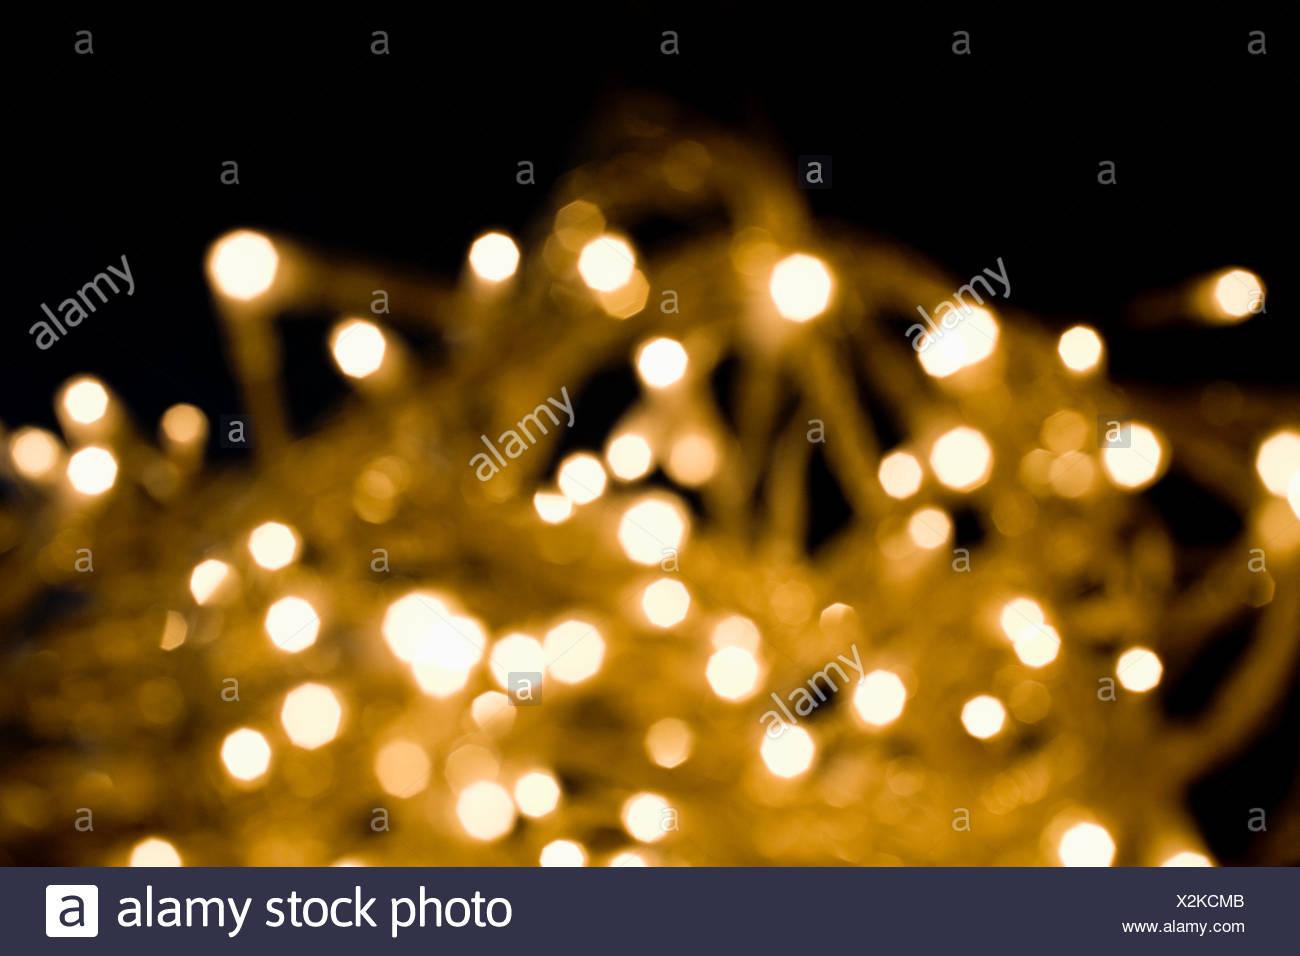 Lights - Stock Image